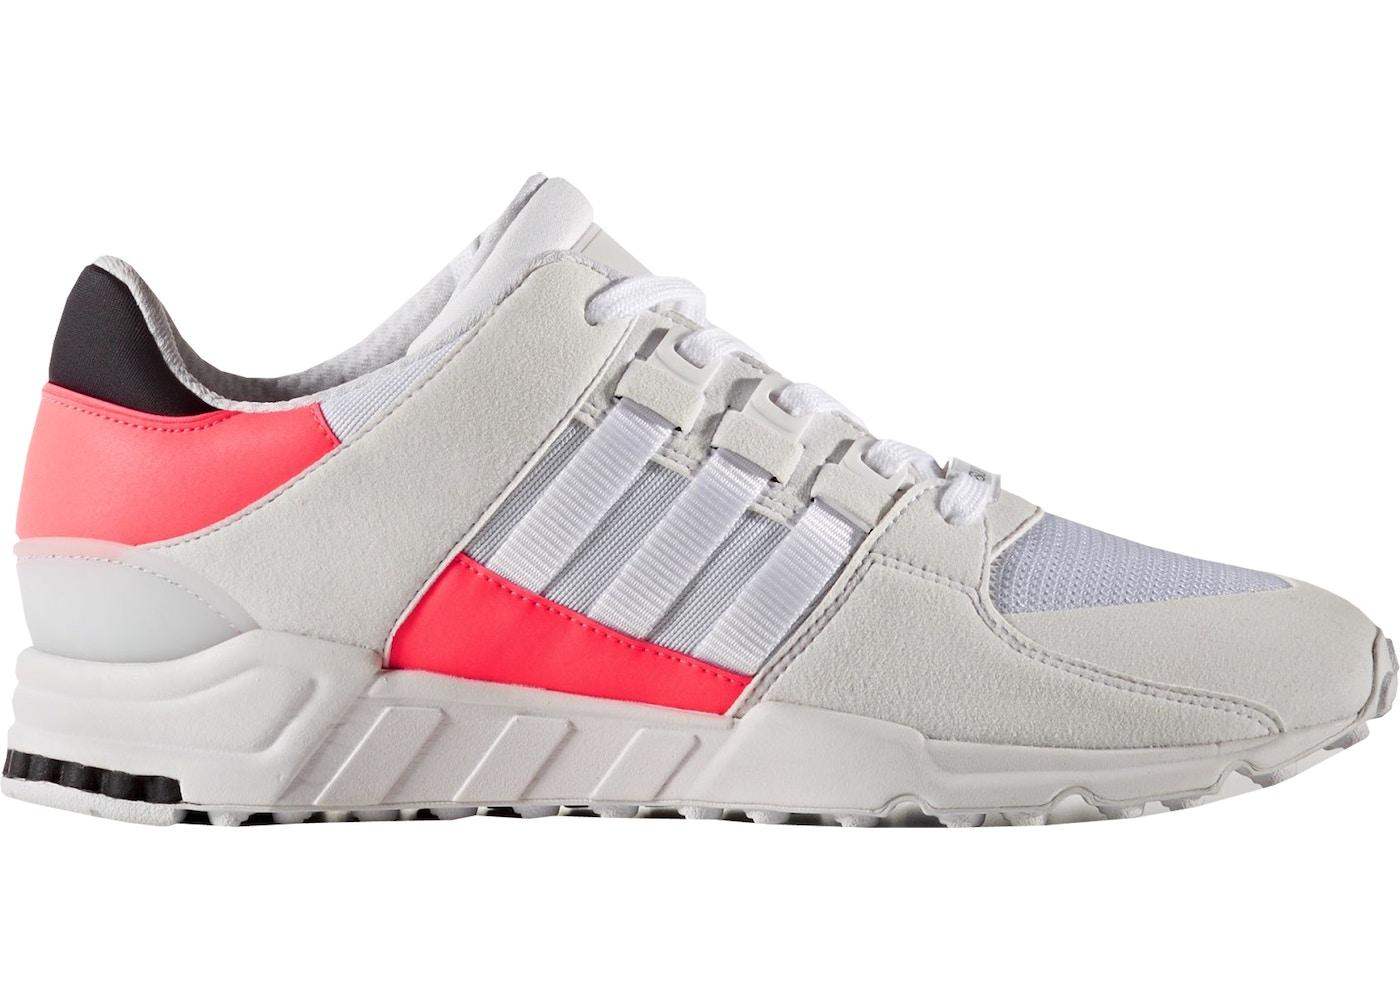 adidas EQT Support RF White Turbo